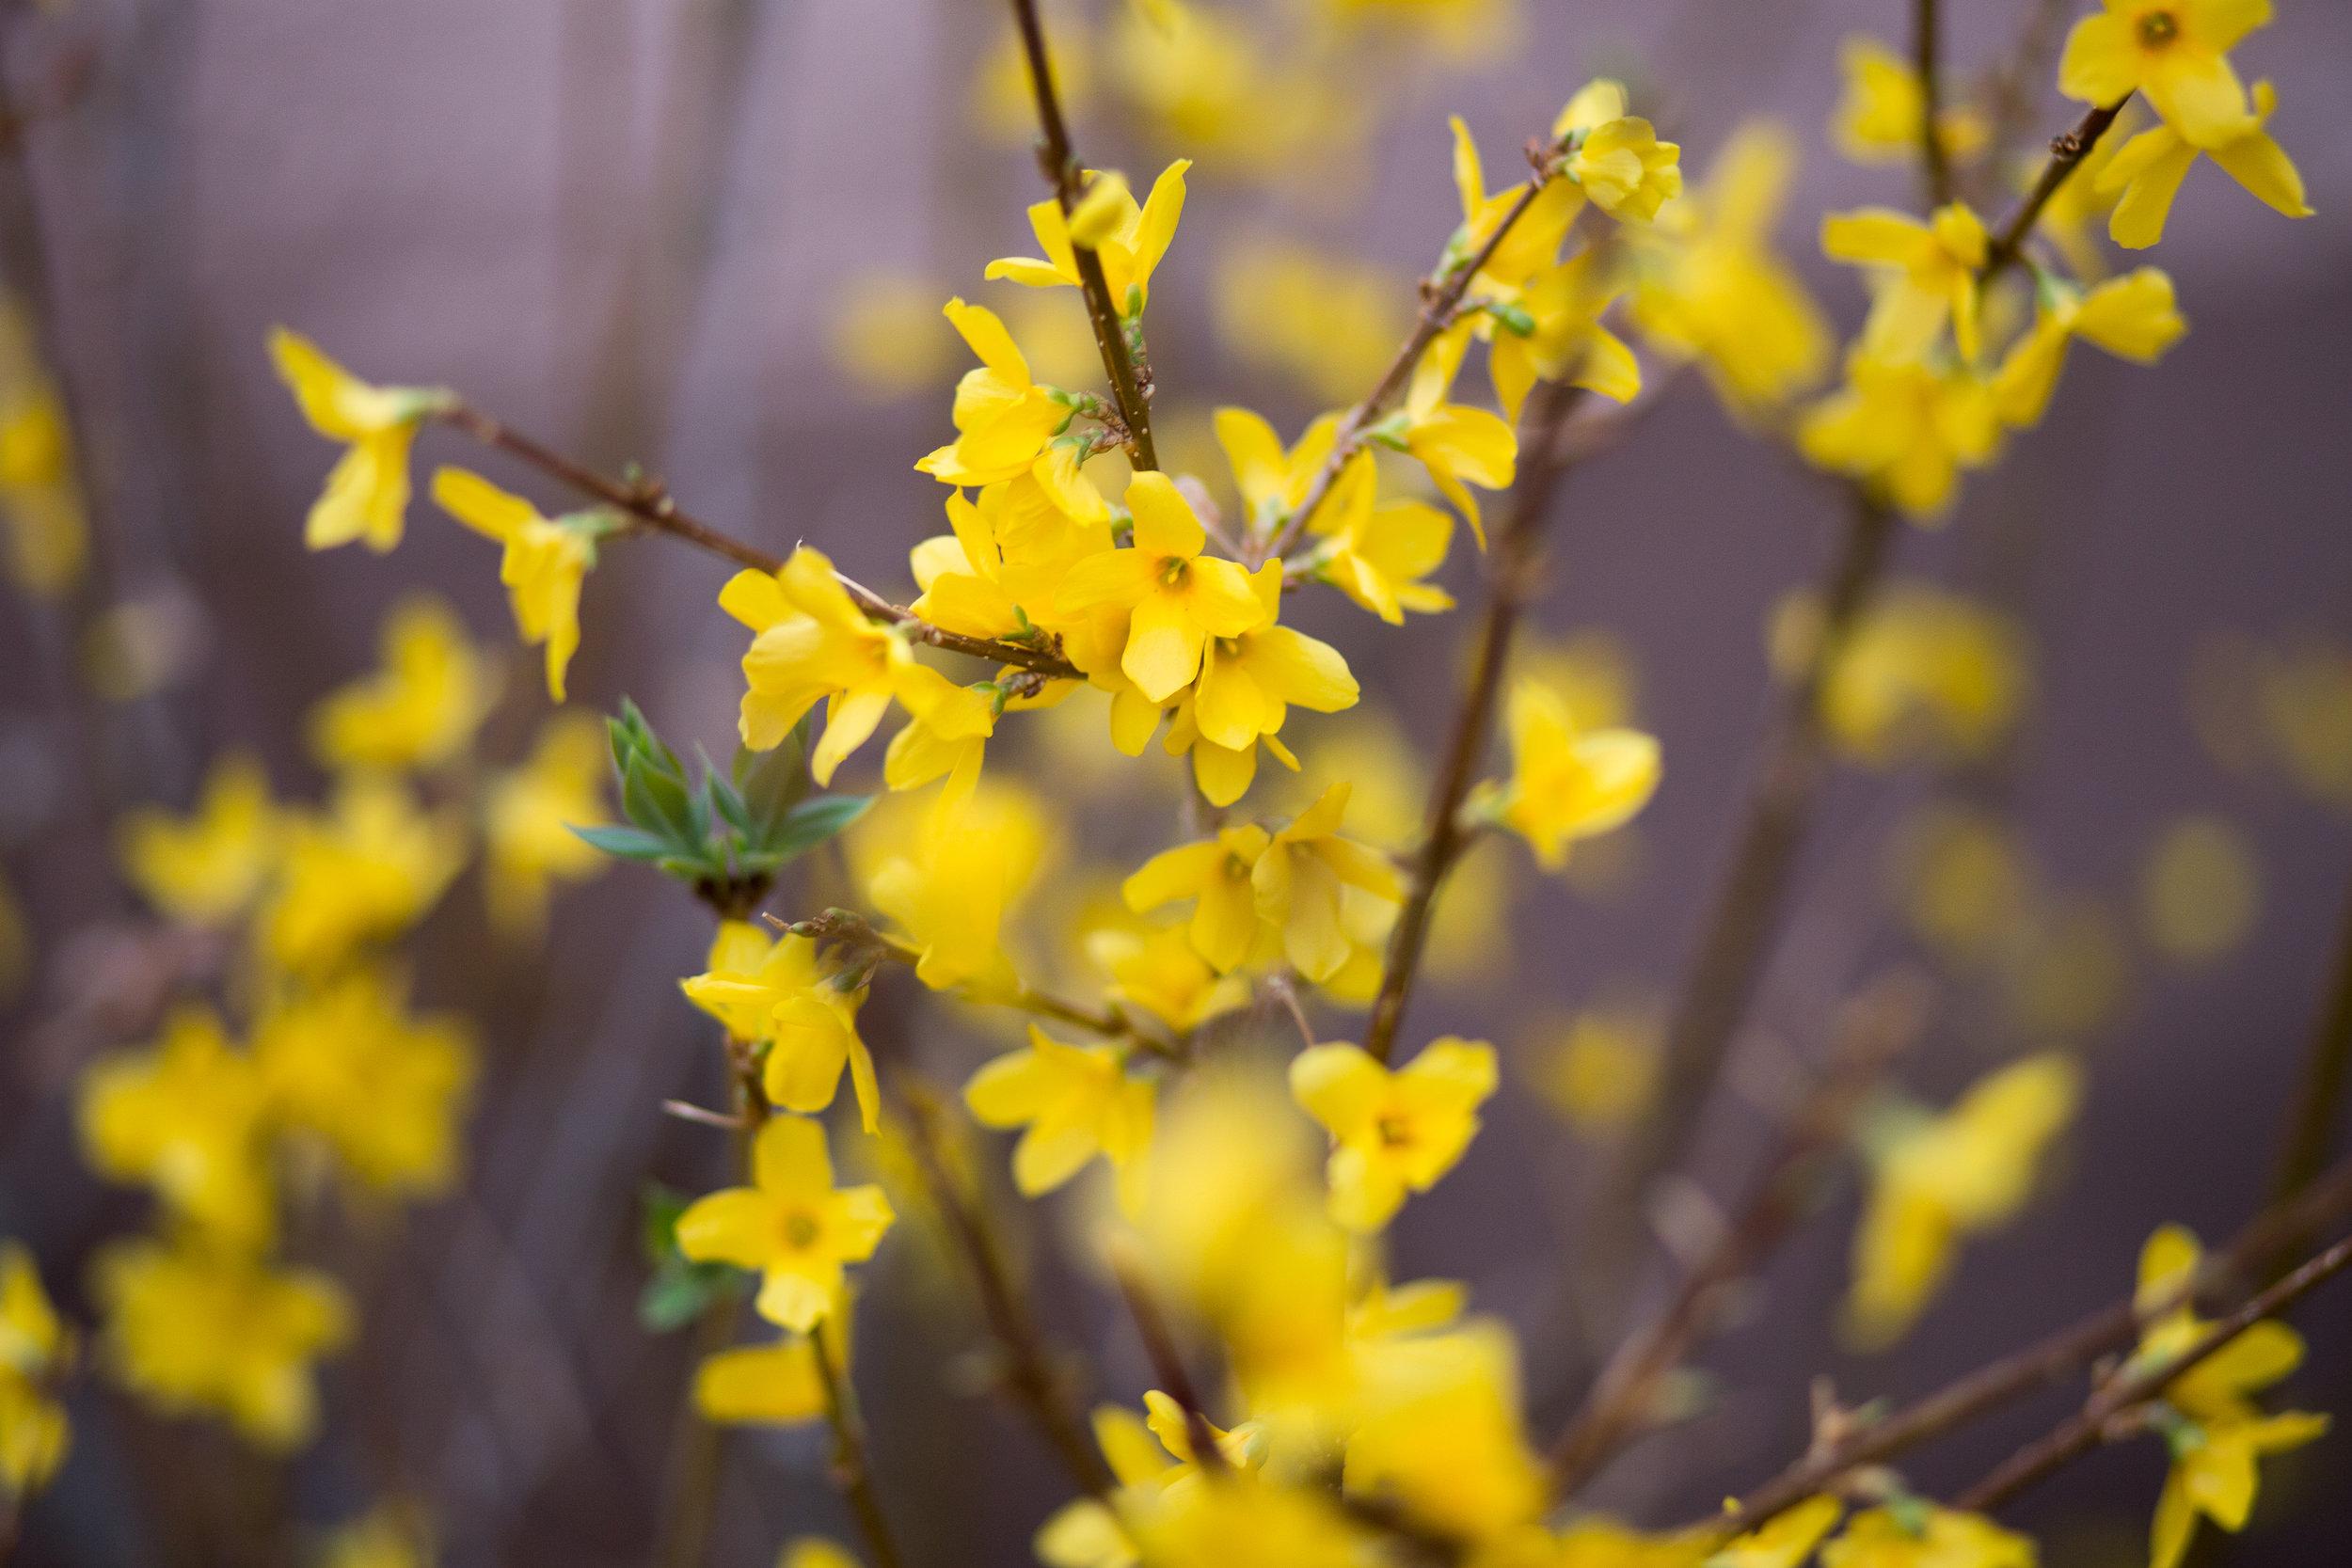 yellow flowers creative photography encouragement